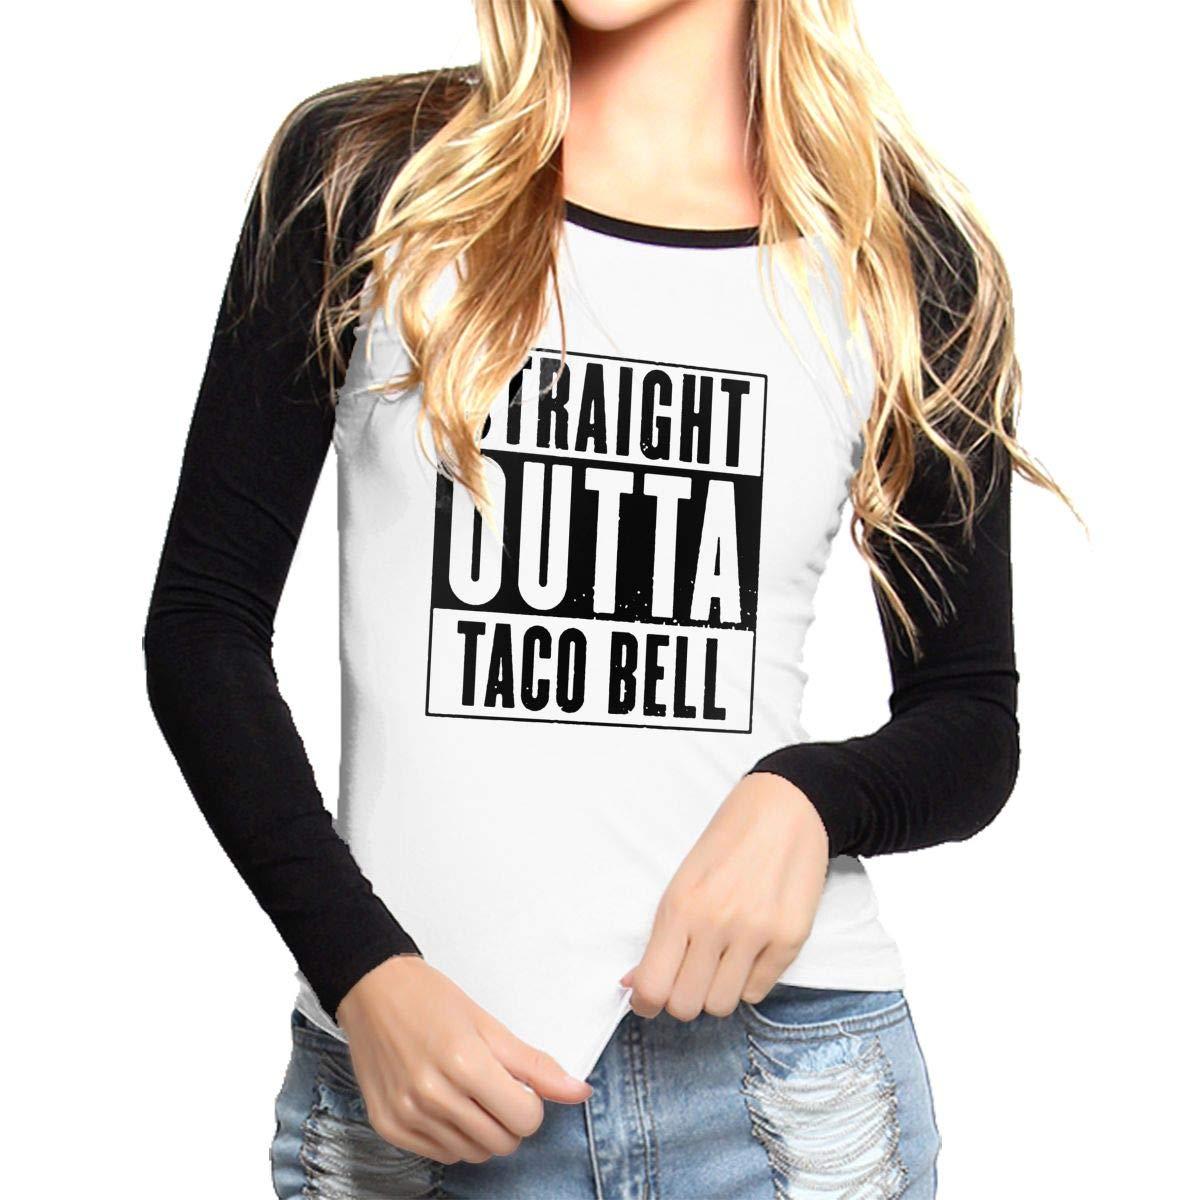 85661663b Amazon.com: Straight Outta Taco Bell Womens Baseball Tee Shirts Long-Sleeve  Women's Raglan Tops Black: Clothing